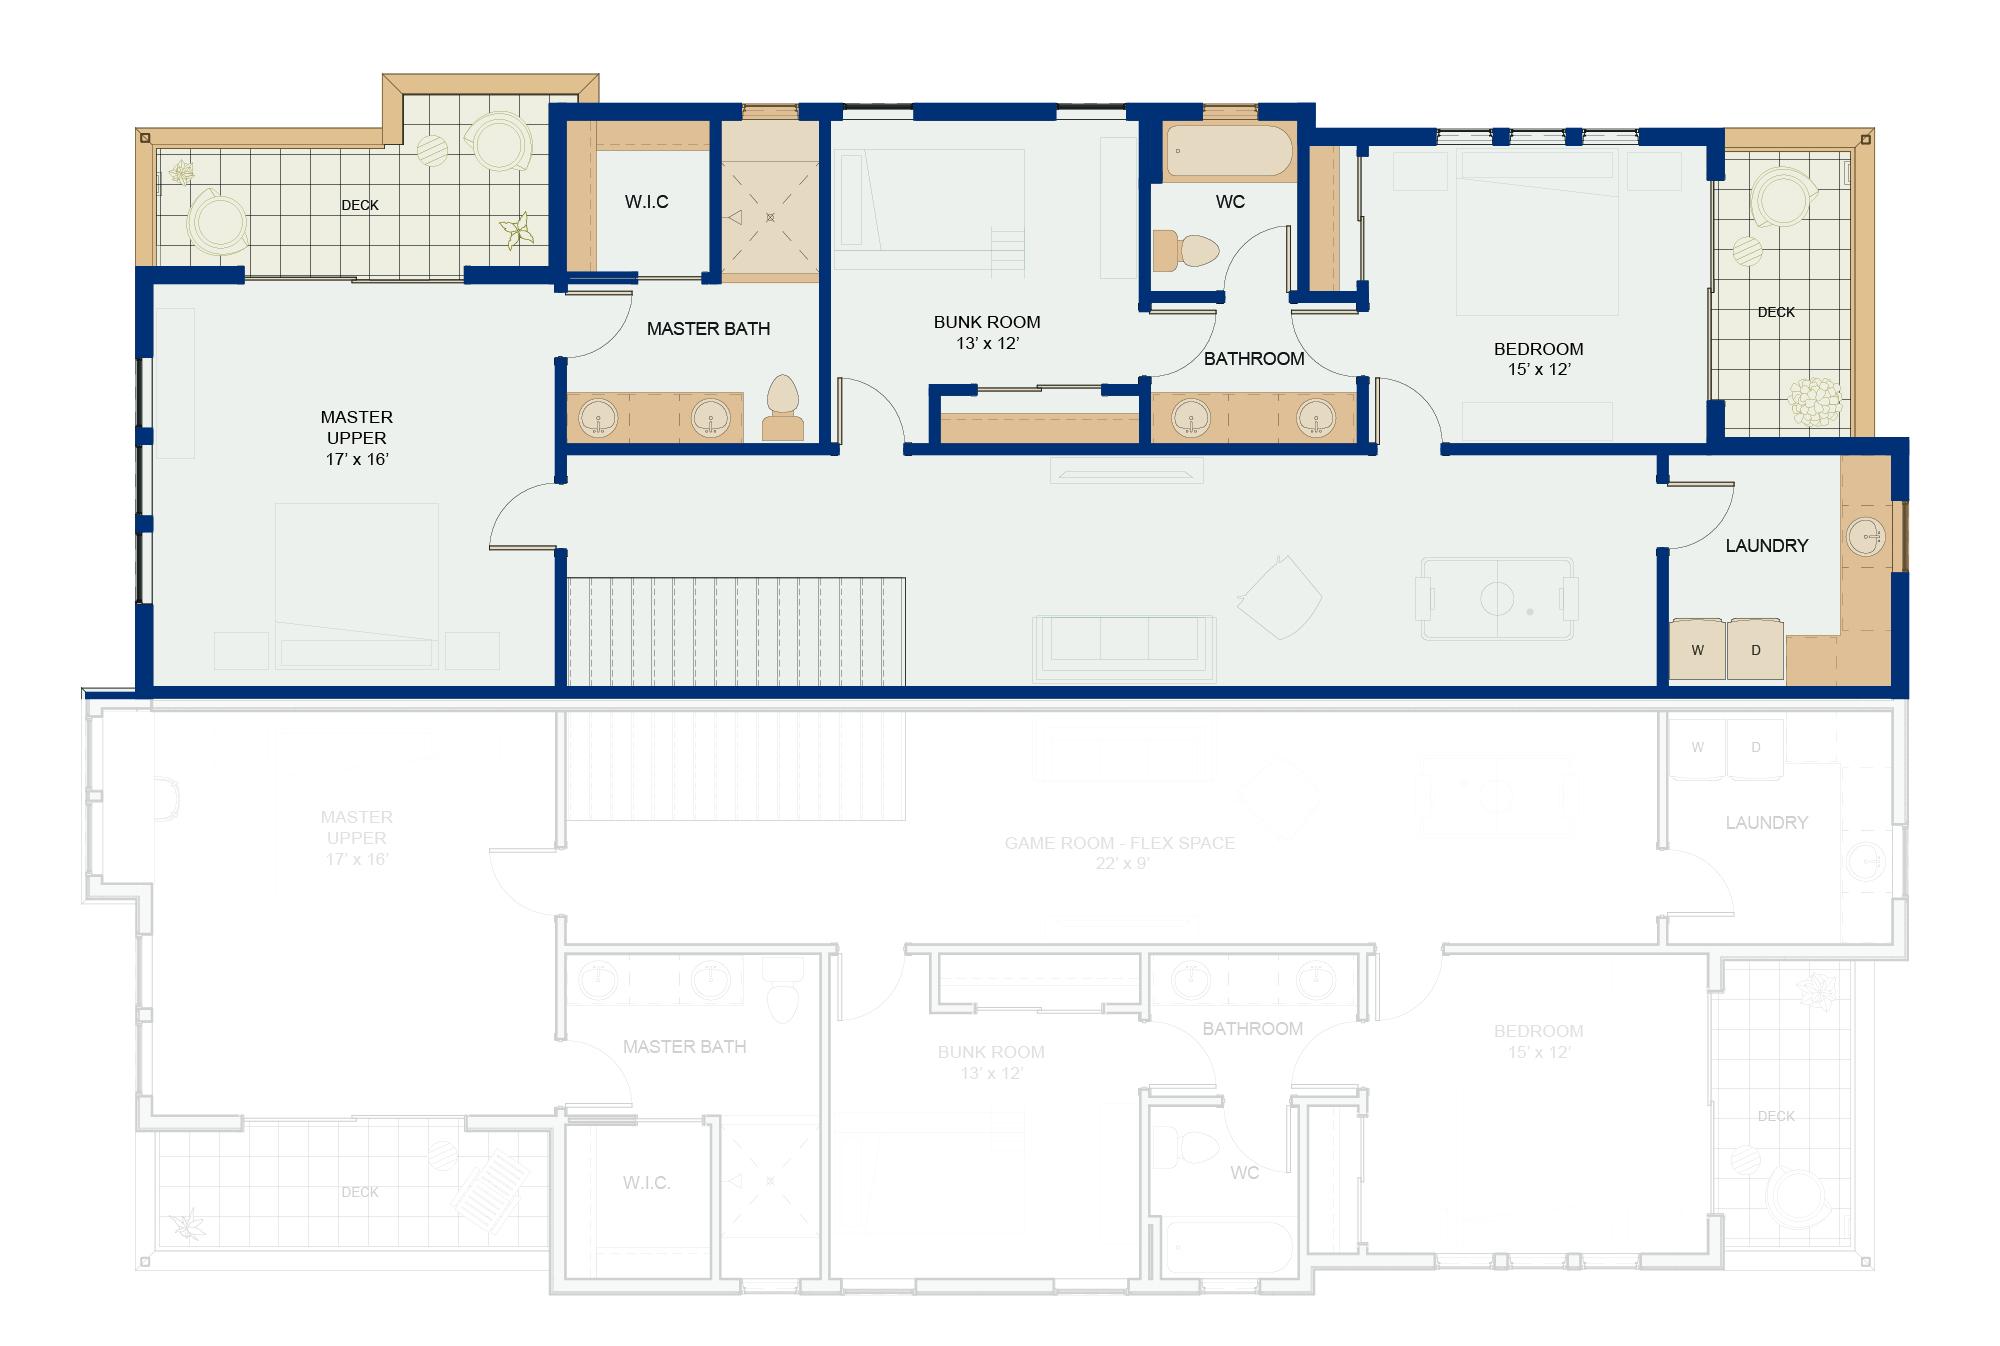 bloomington-villa-floor-plans-condos-March2019-town1-upper-web.jpg